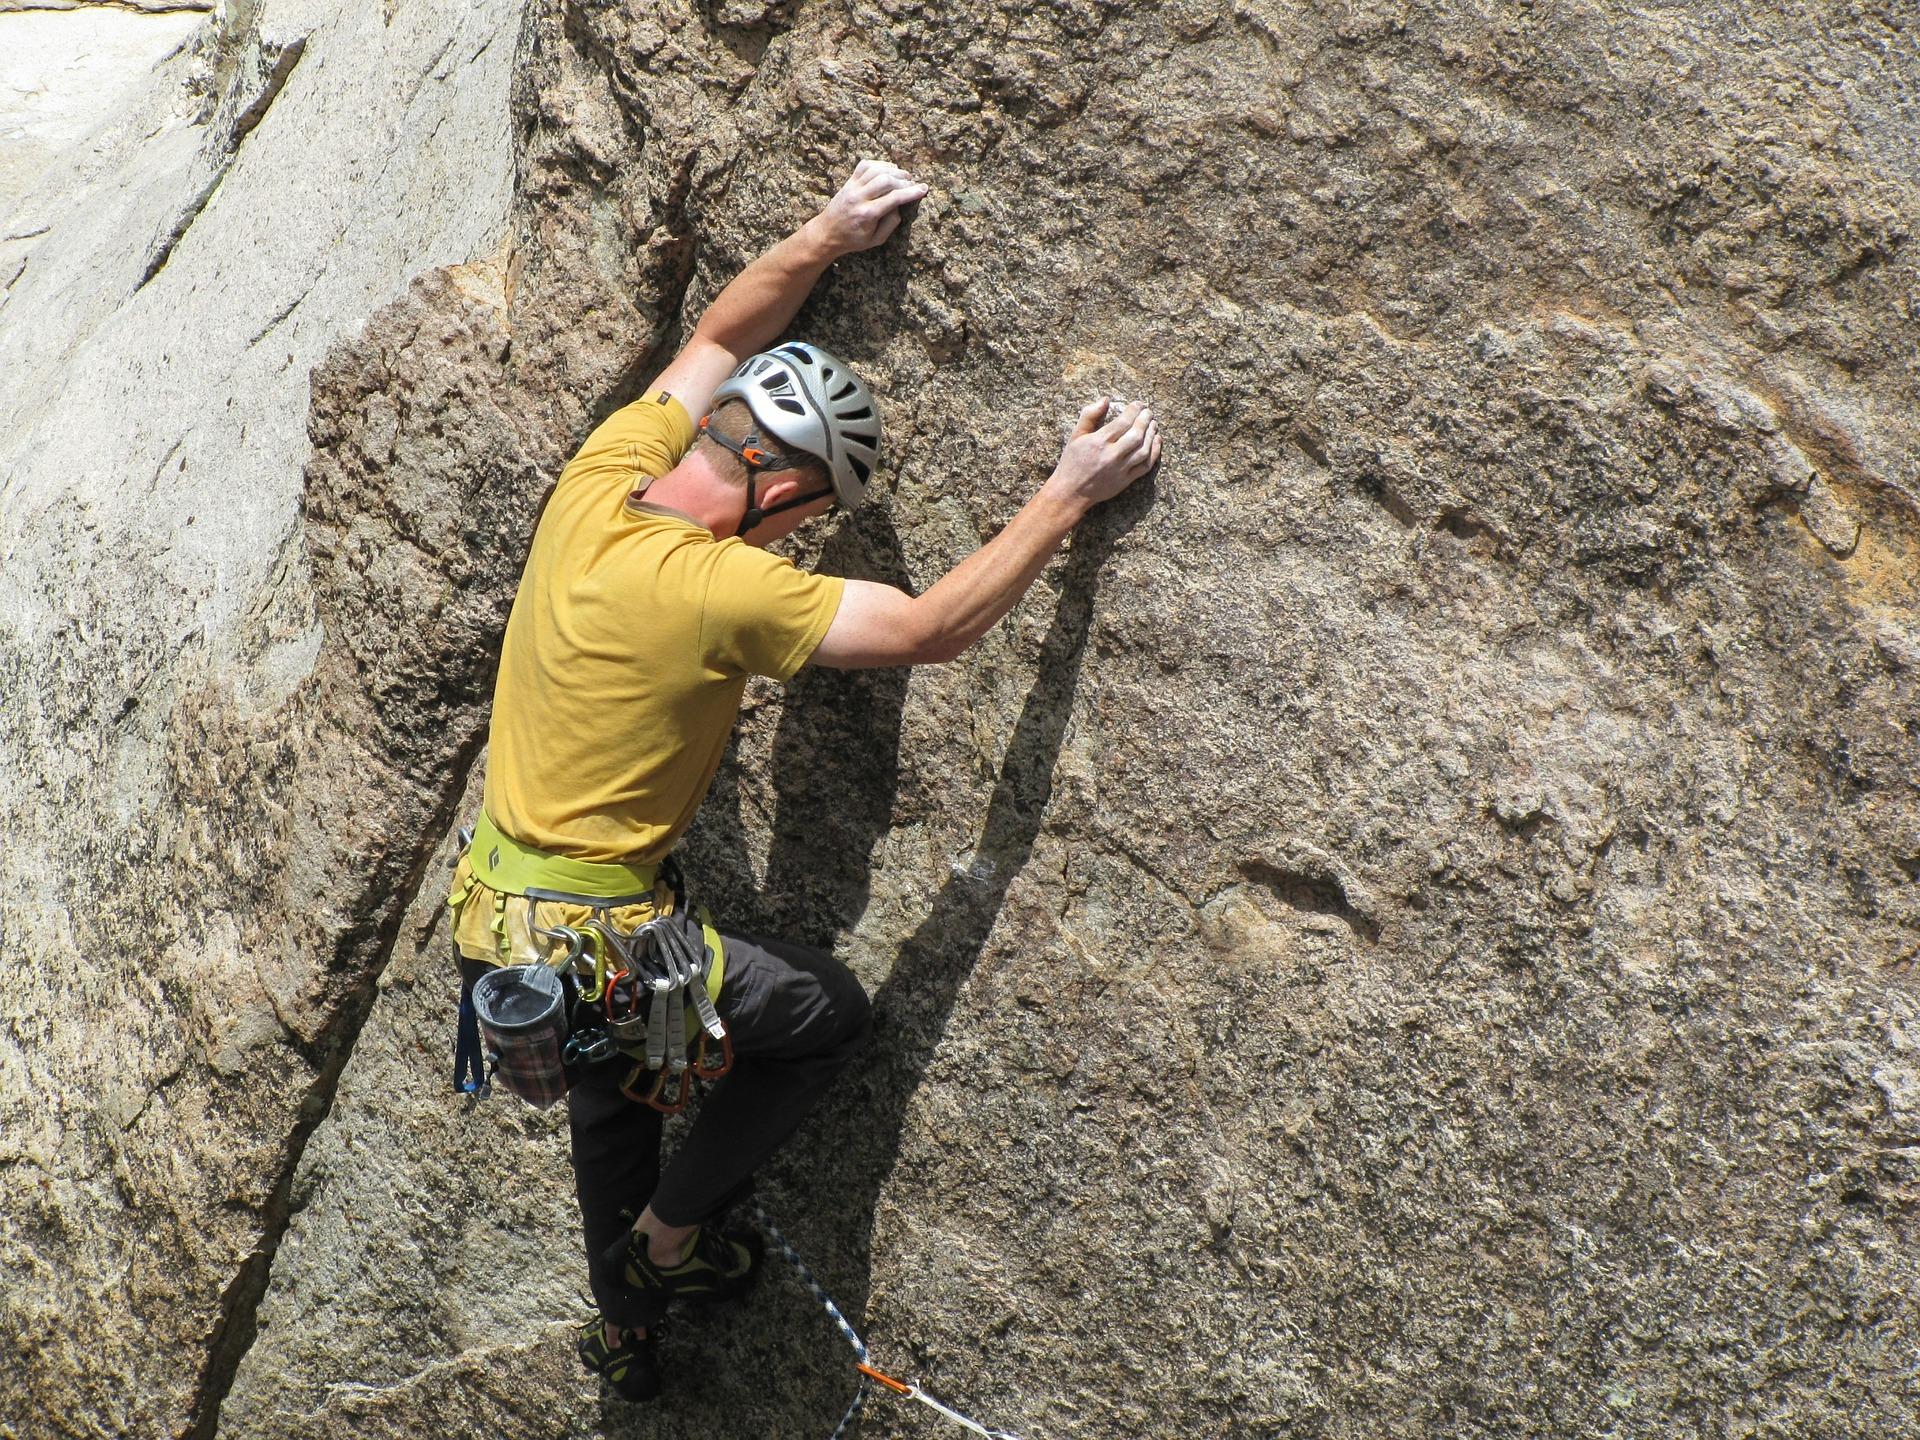 rock-climbing-403487_1920